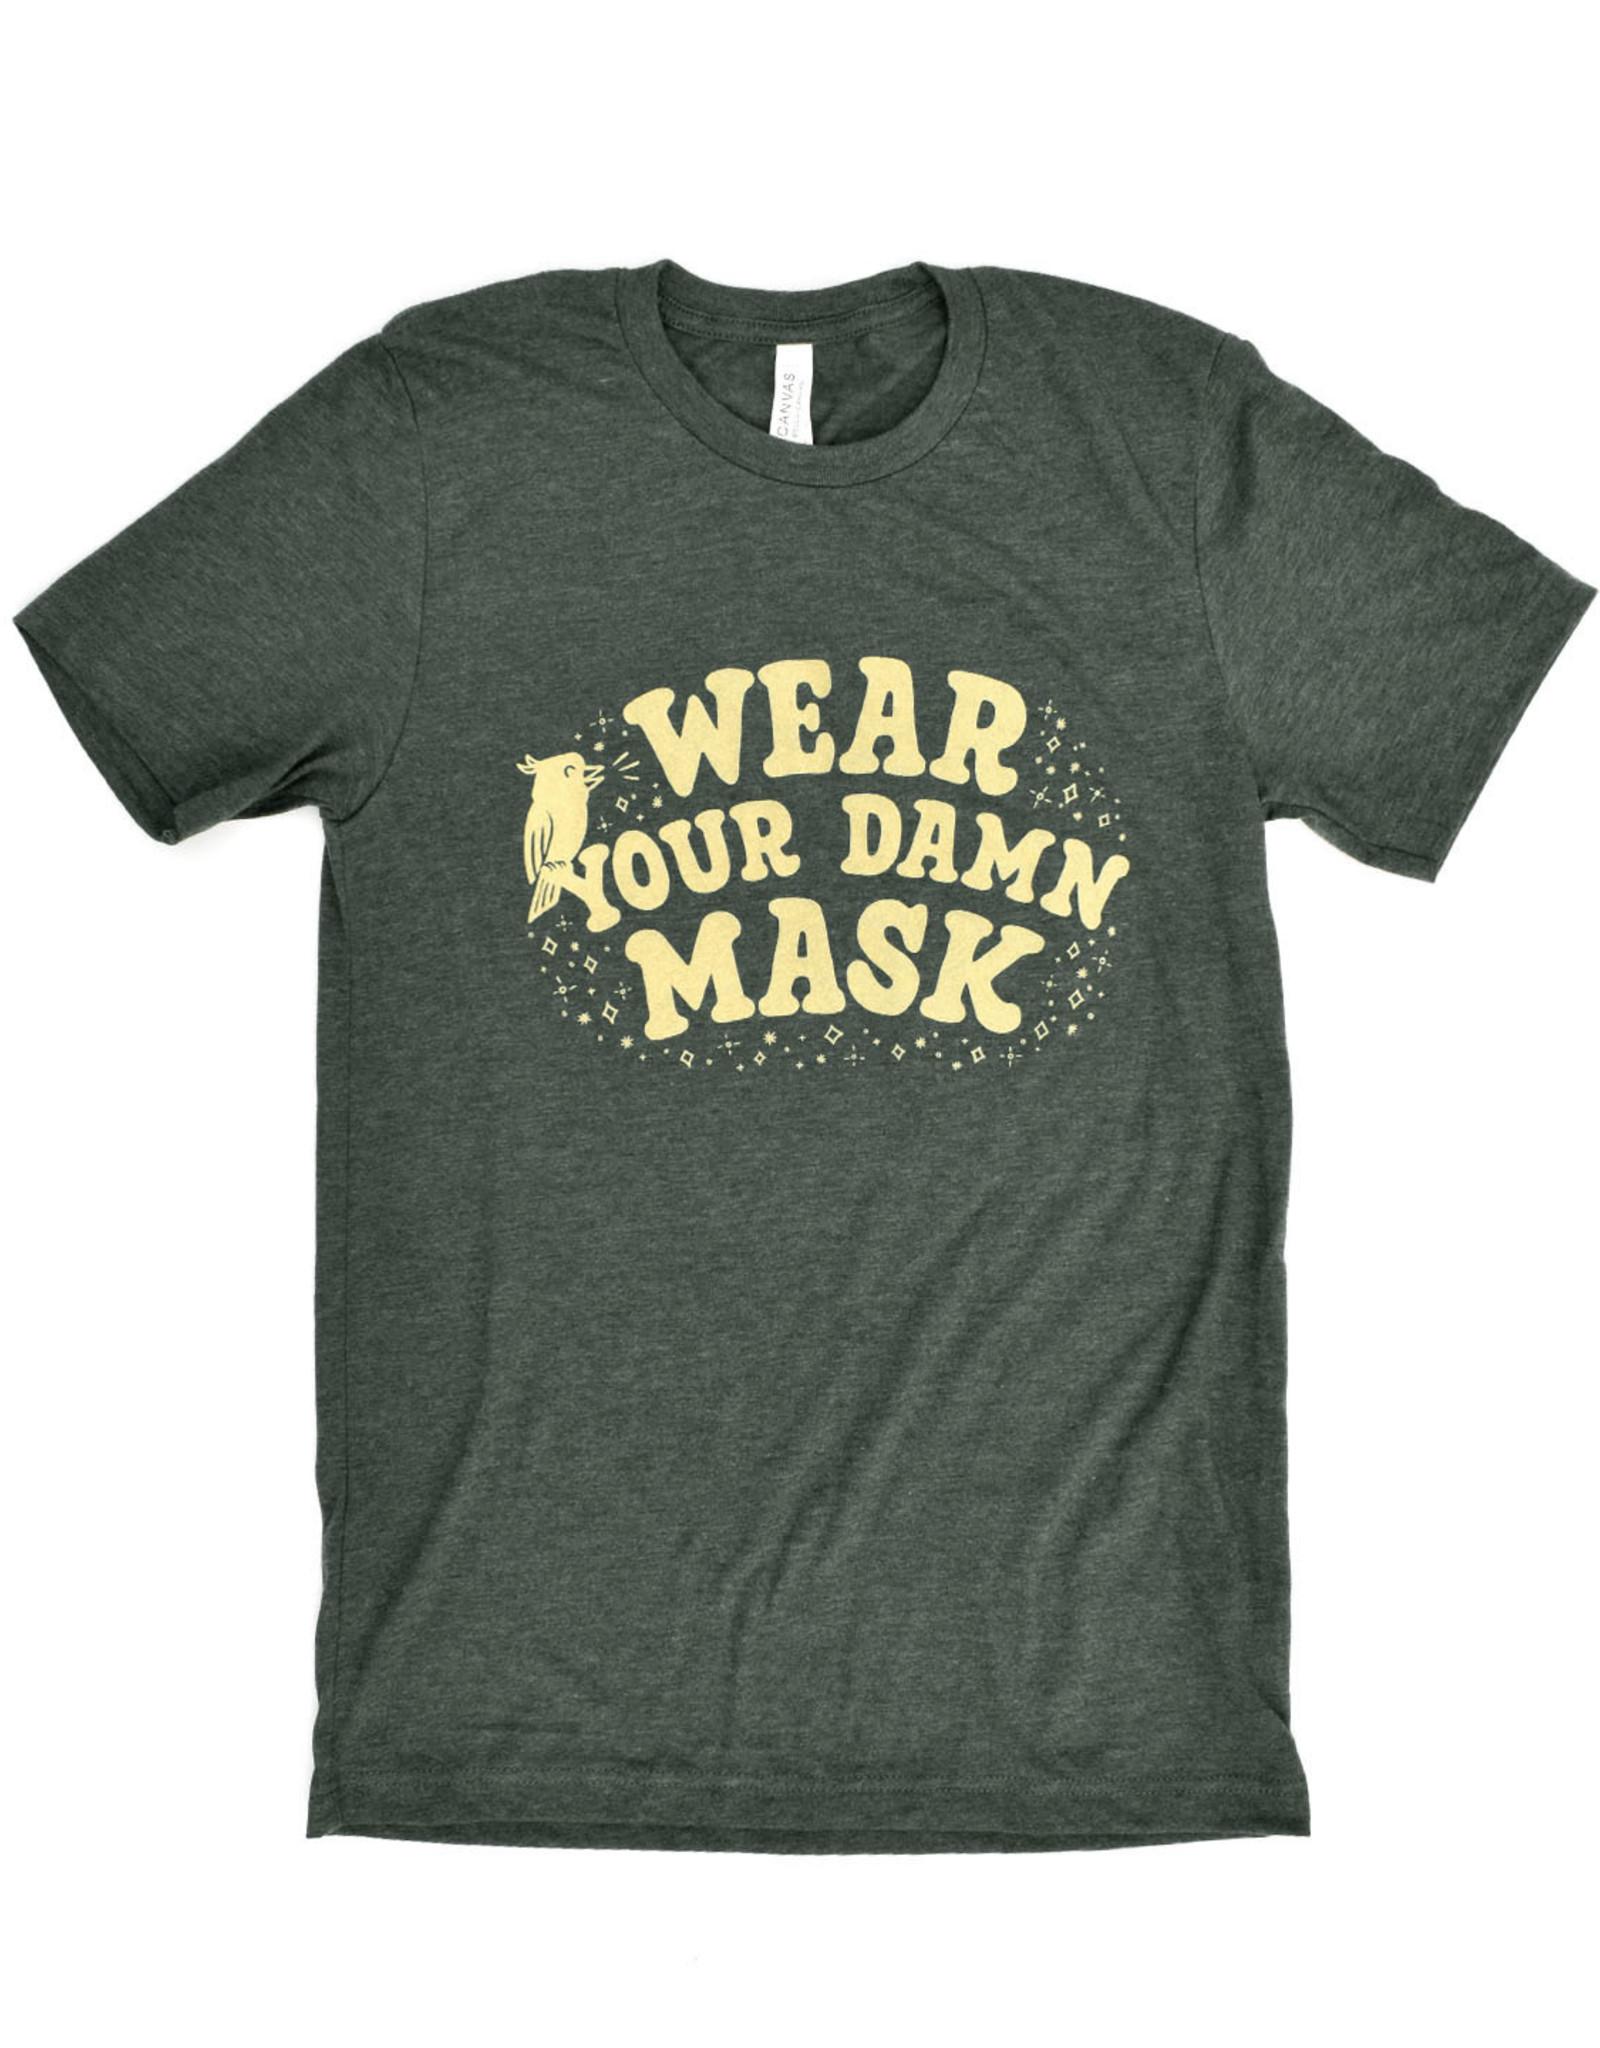 Wear Your Damn Mask T-Shirt